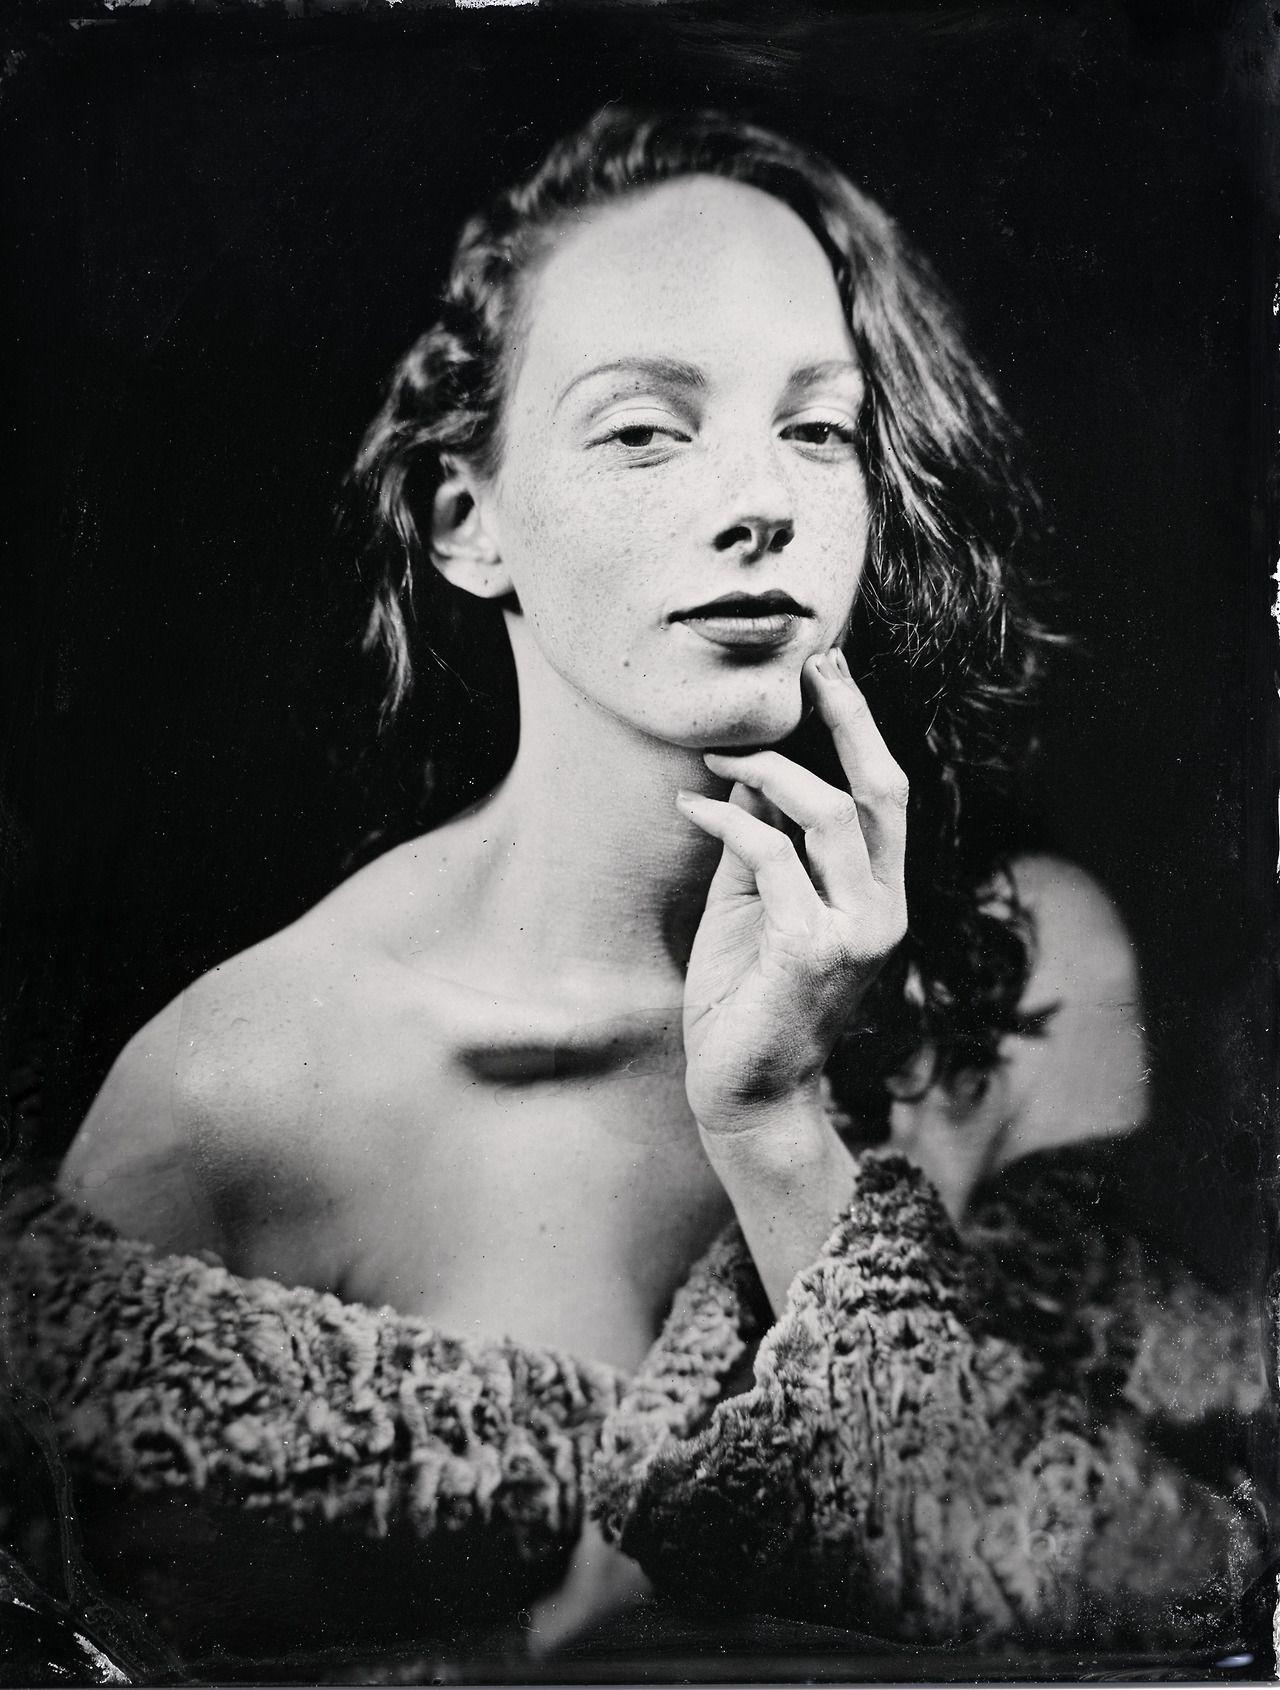 when were tintype photos made